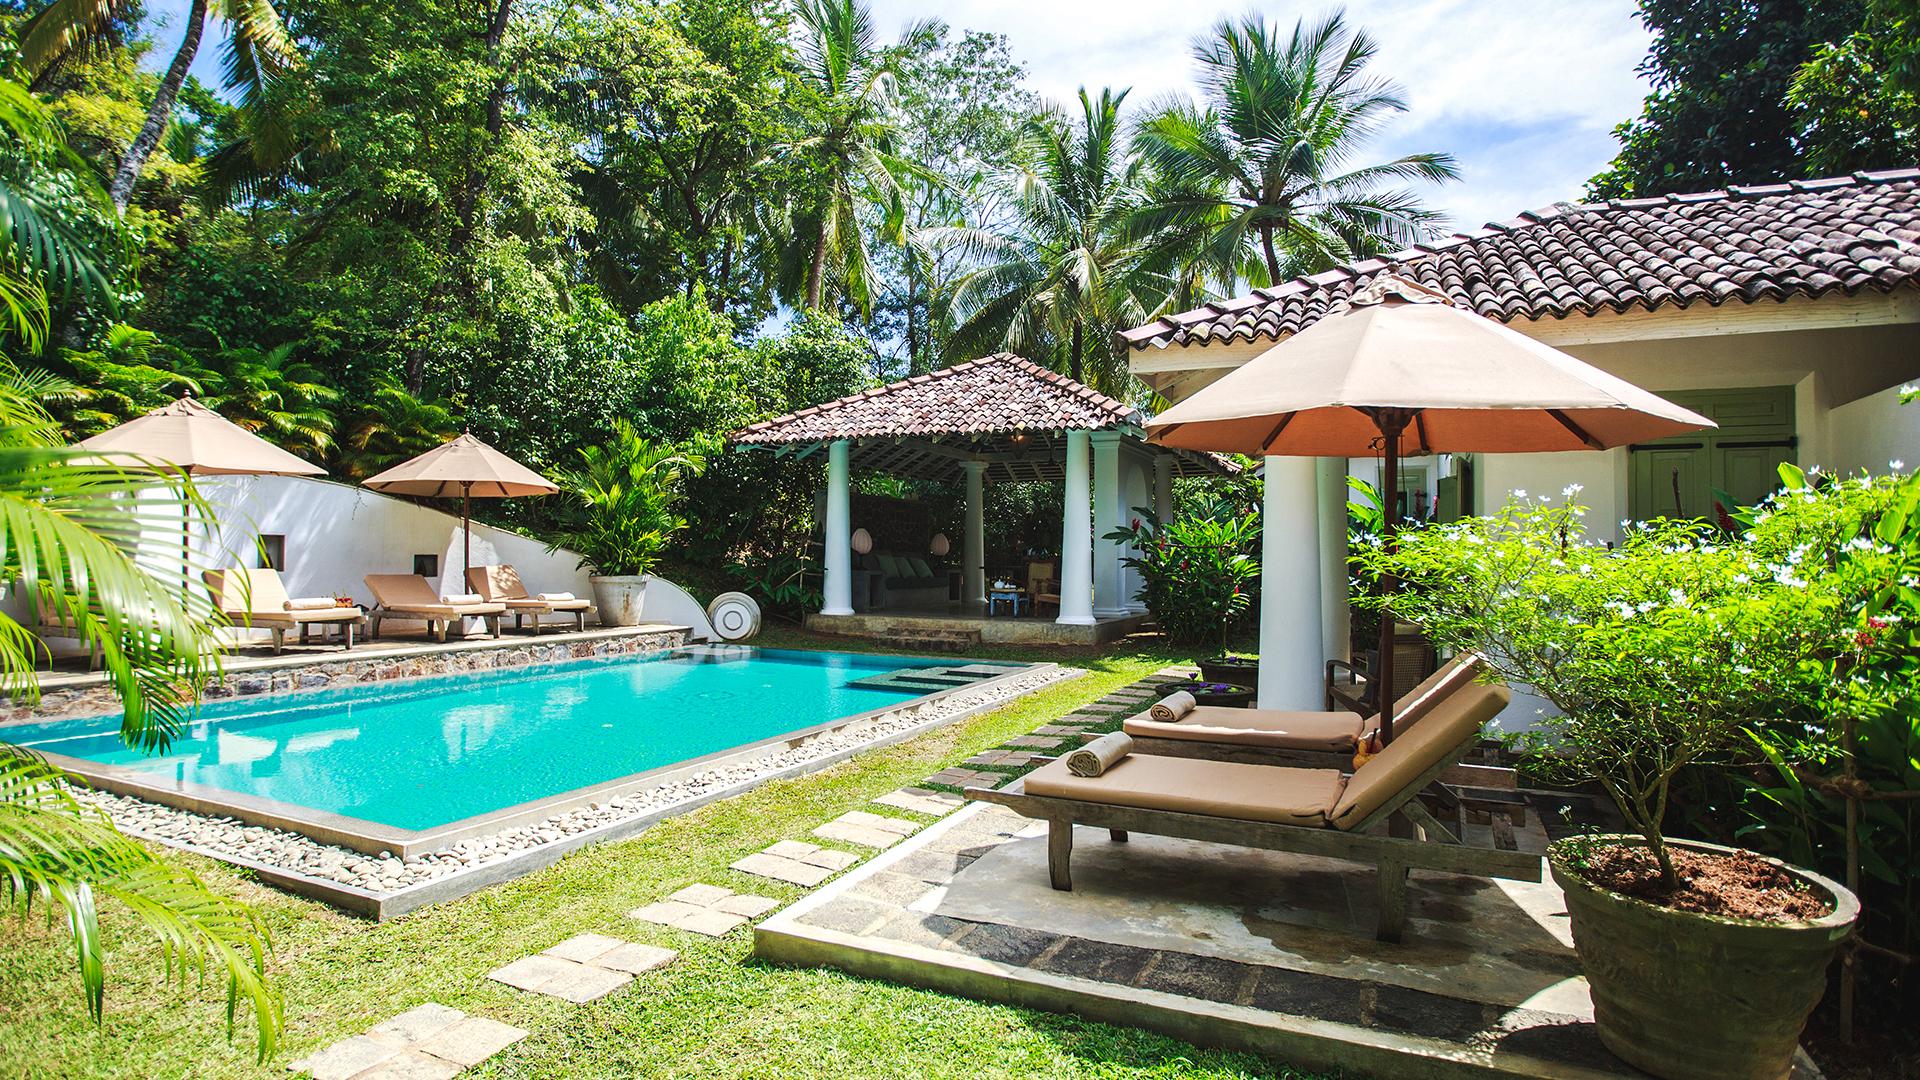 Sri_lanka_holiday_villa_gab_suiteArtboard 1 copy 3_1.jpg